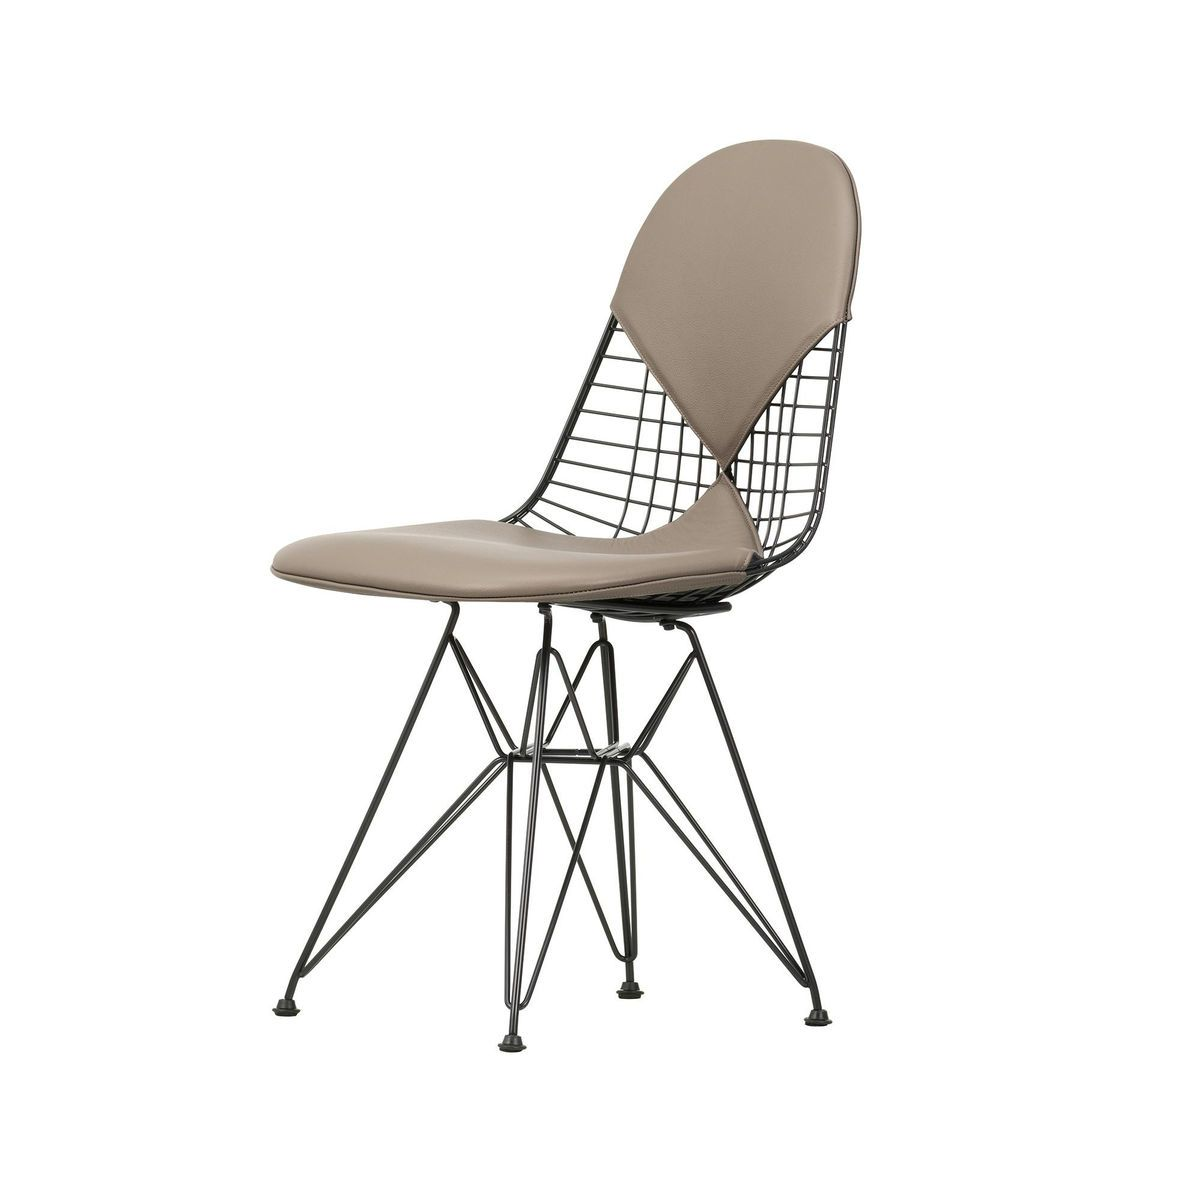 Eames wire chair dkr 2 silla al 43cm vitra - Sillas vitra precios ...